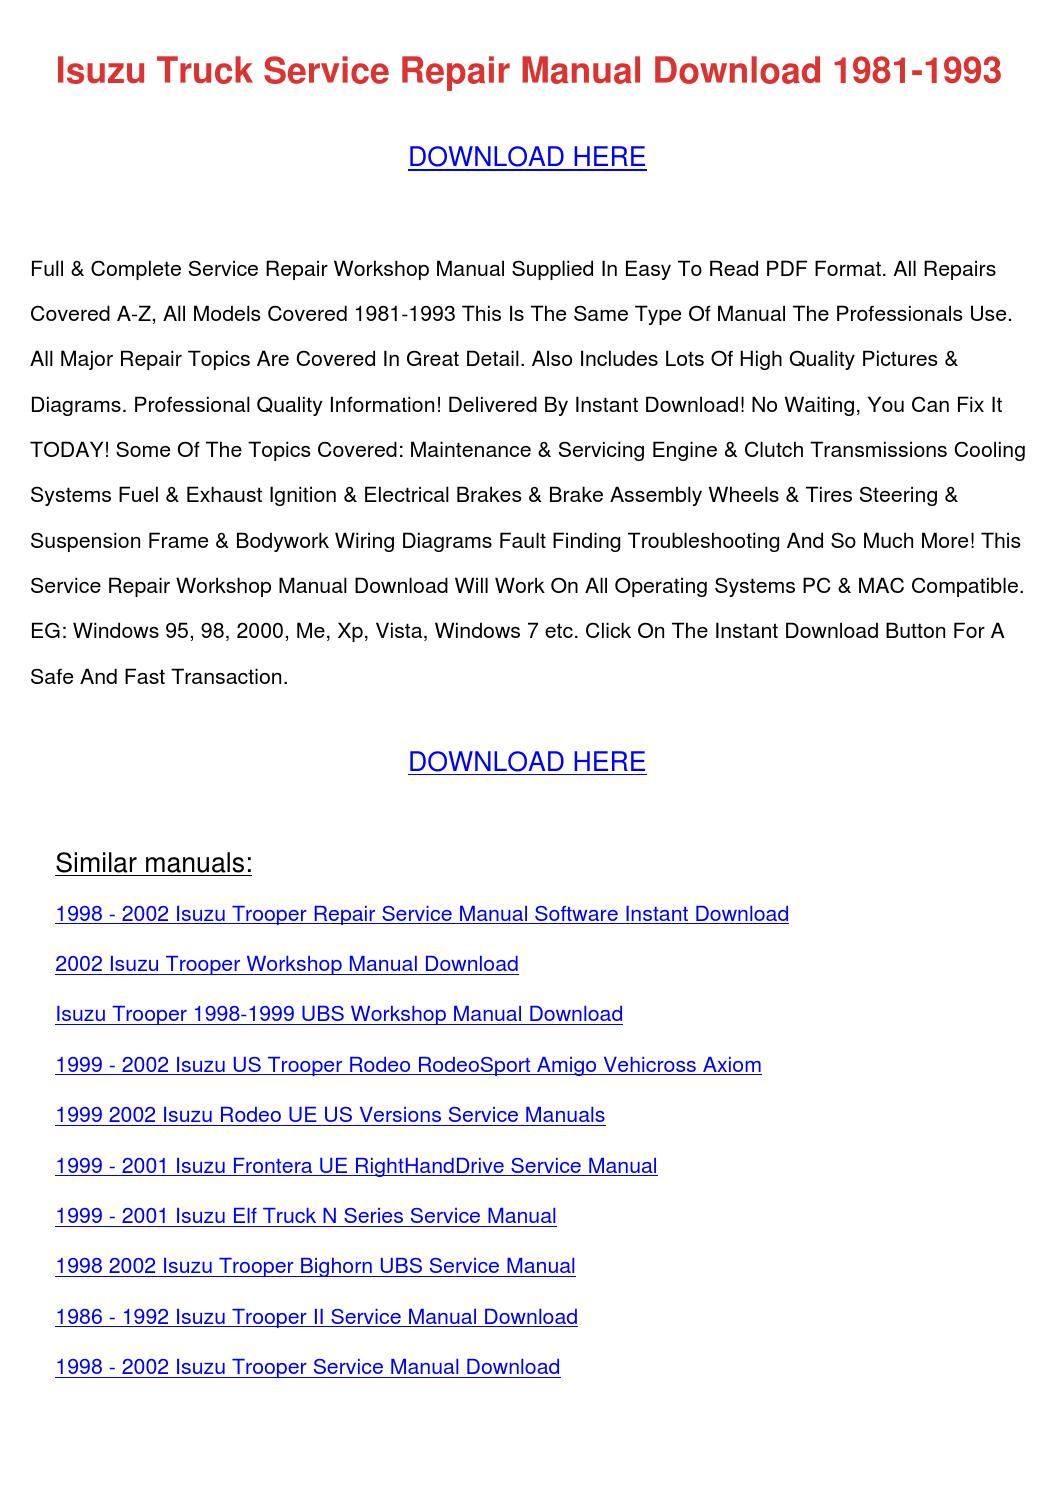 Isuzu truck service repair manual download 19 by cristinacapps issuu publicscrutiny Gallery